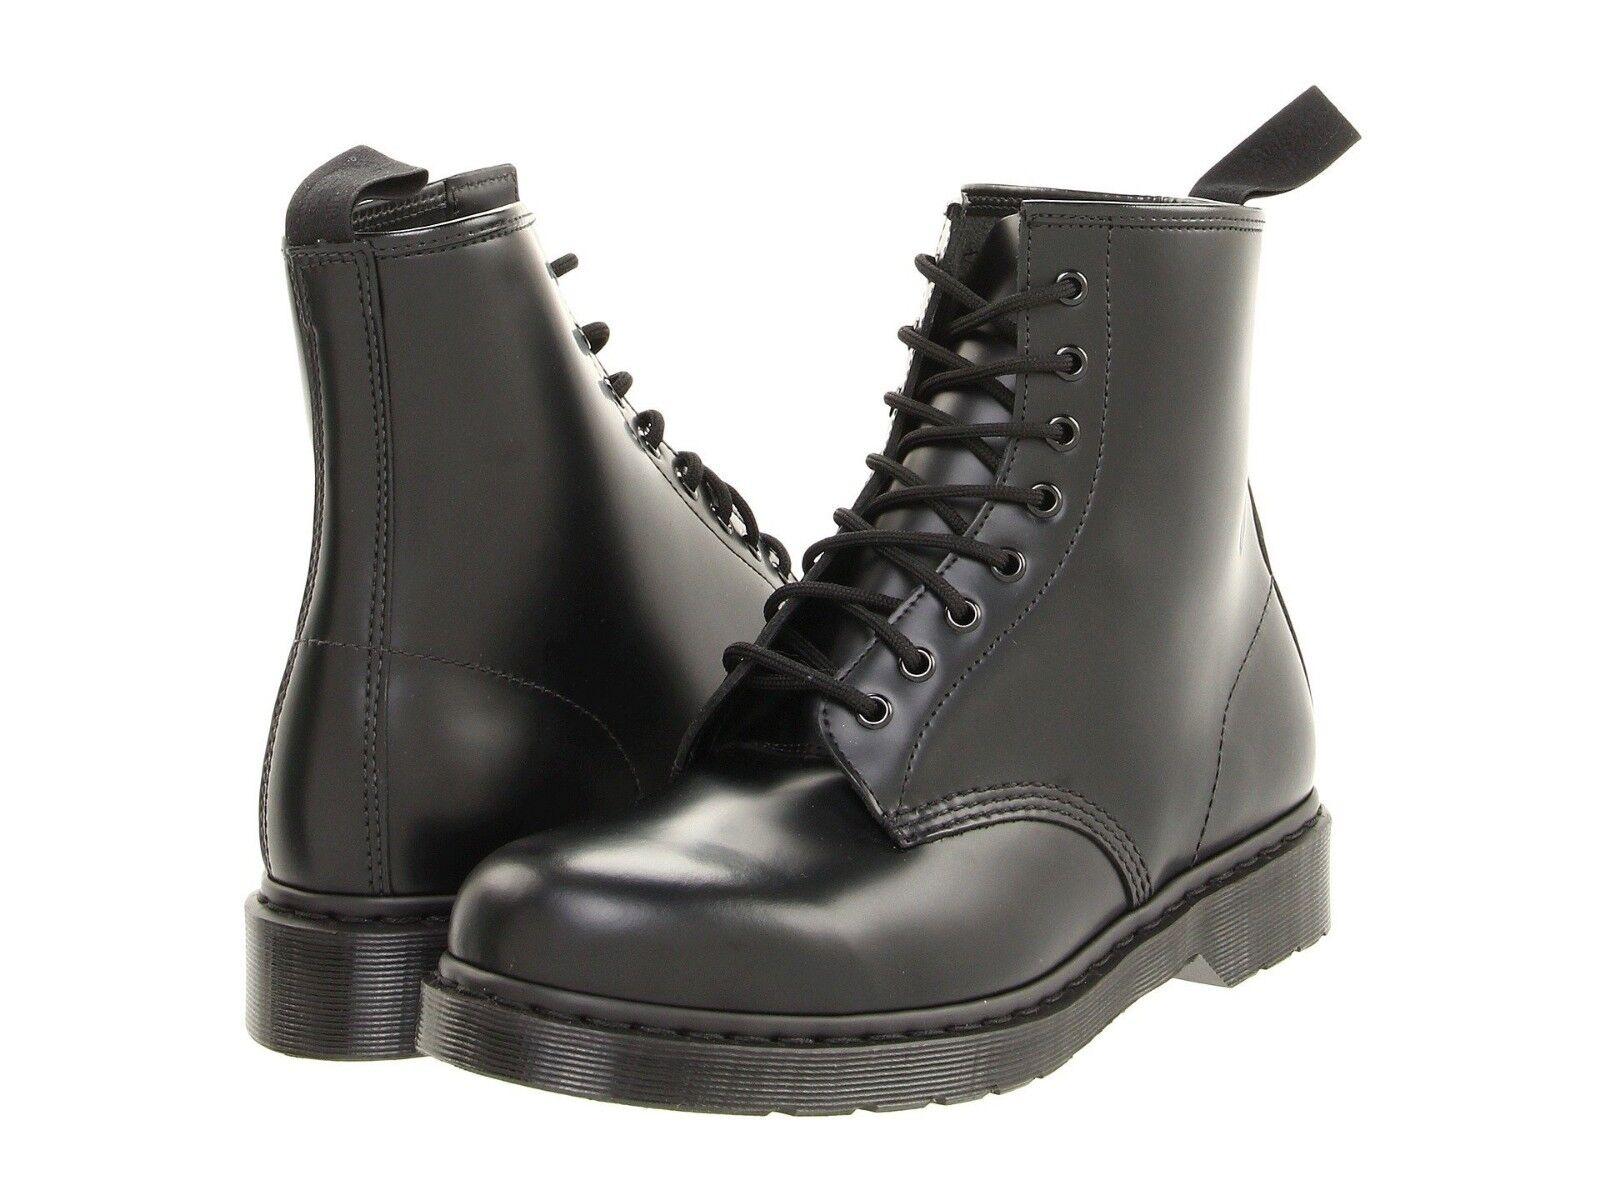 Authentic Men's shoes Dr. Martens Mono 1460 8-Eye Black Leather Ankle Boots